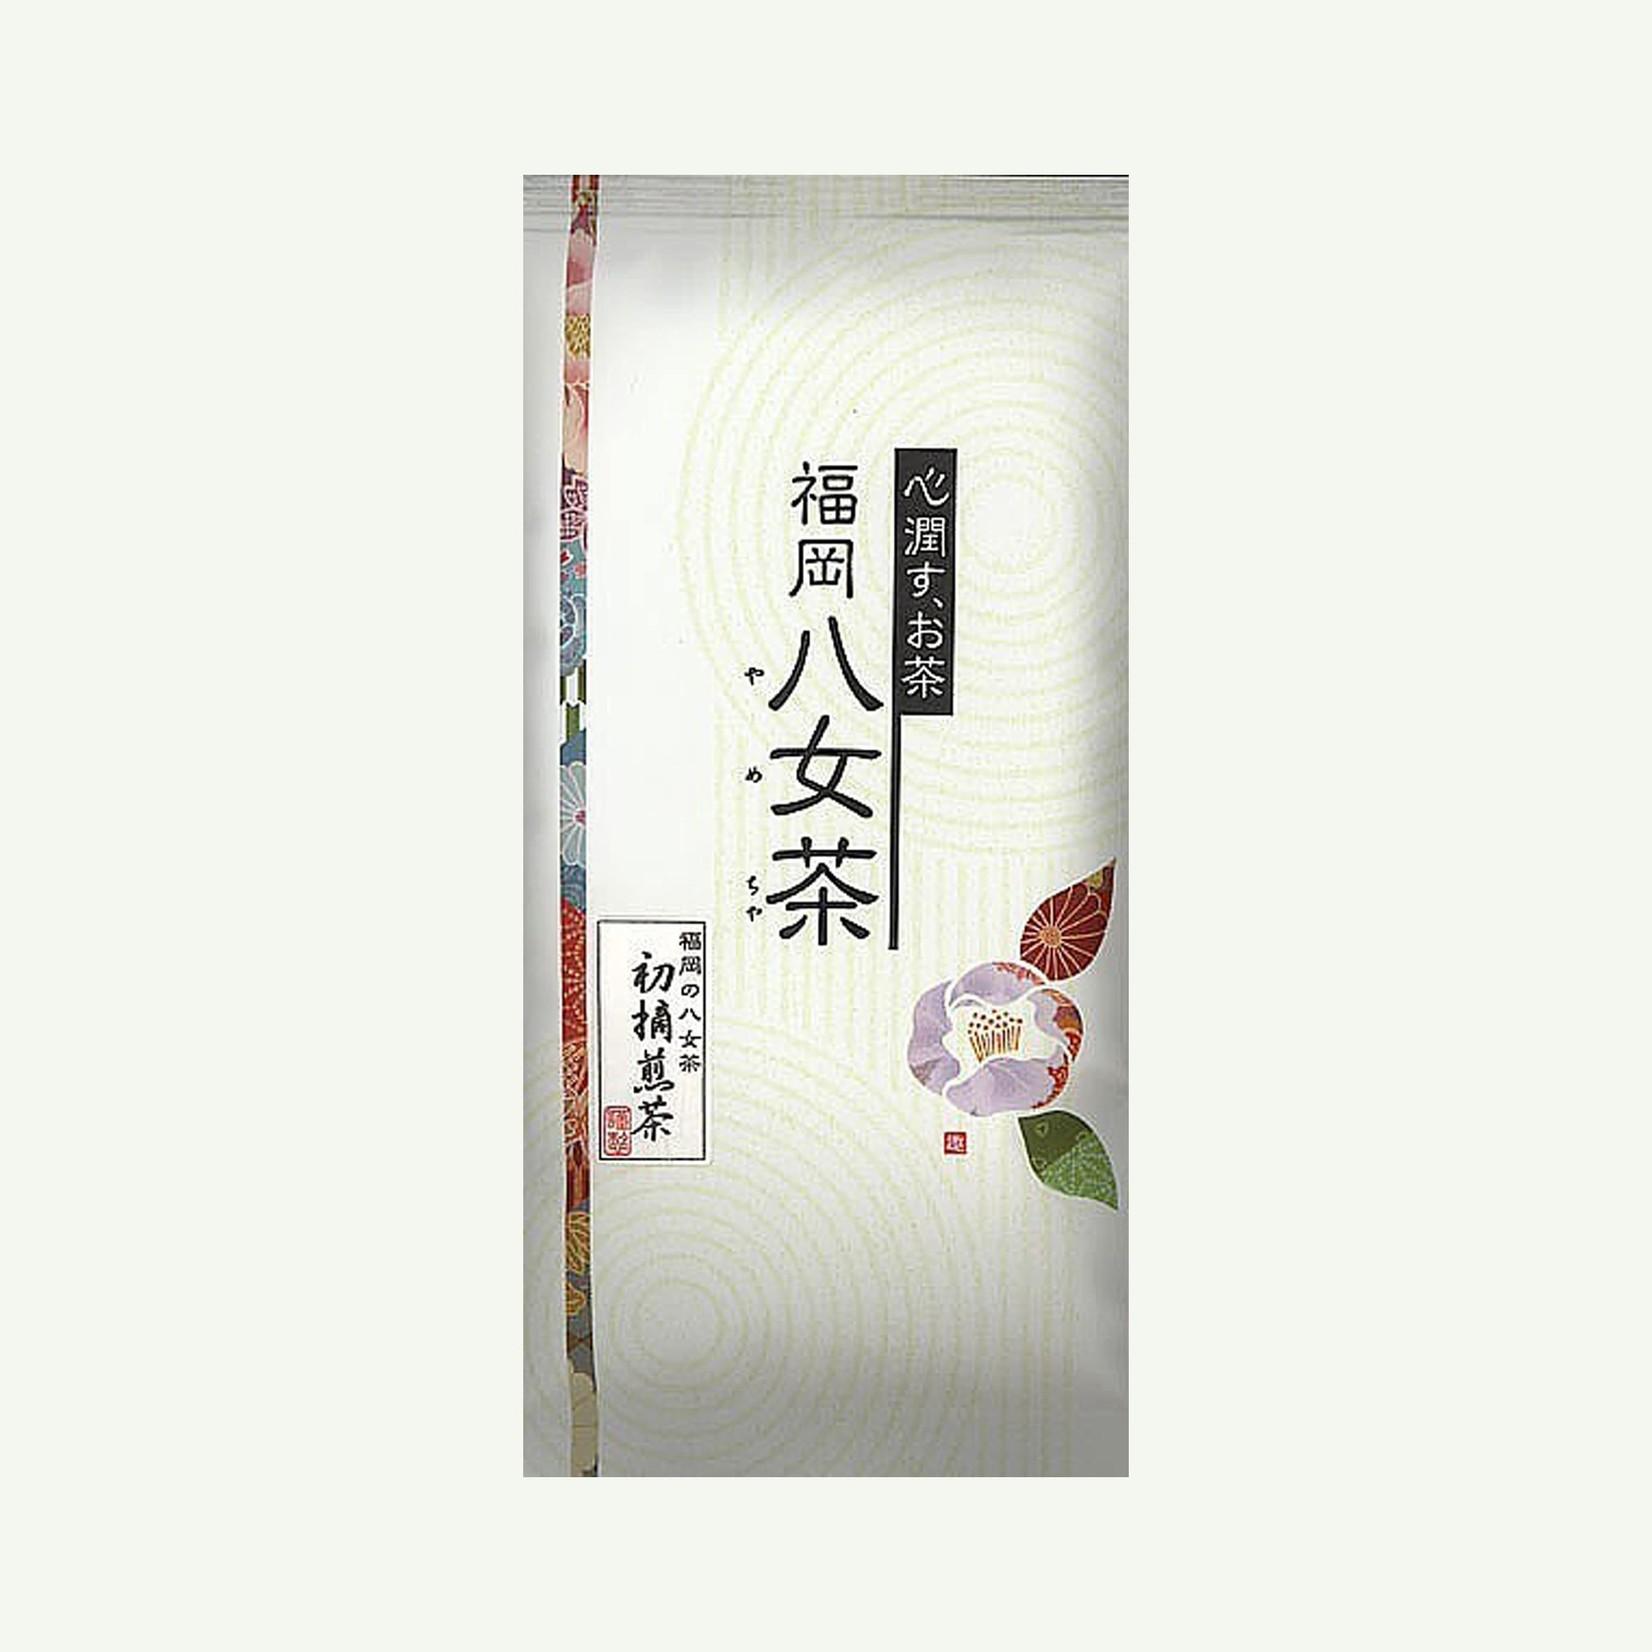 Sencha Hatsuzumi 100g - Losse thee